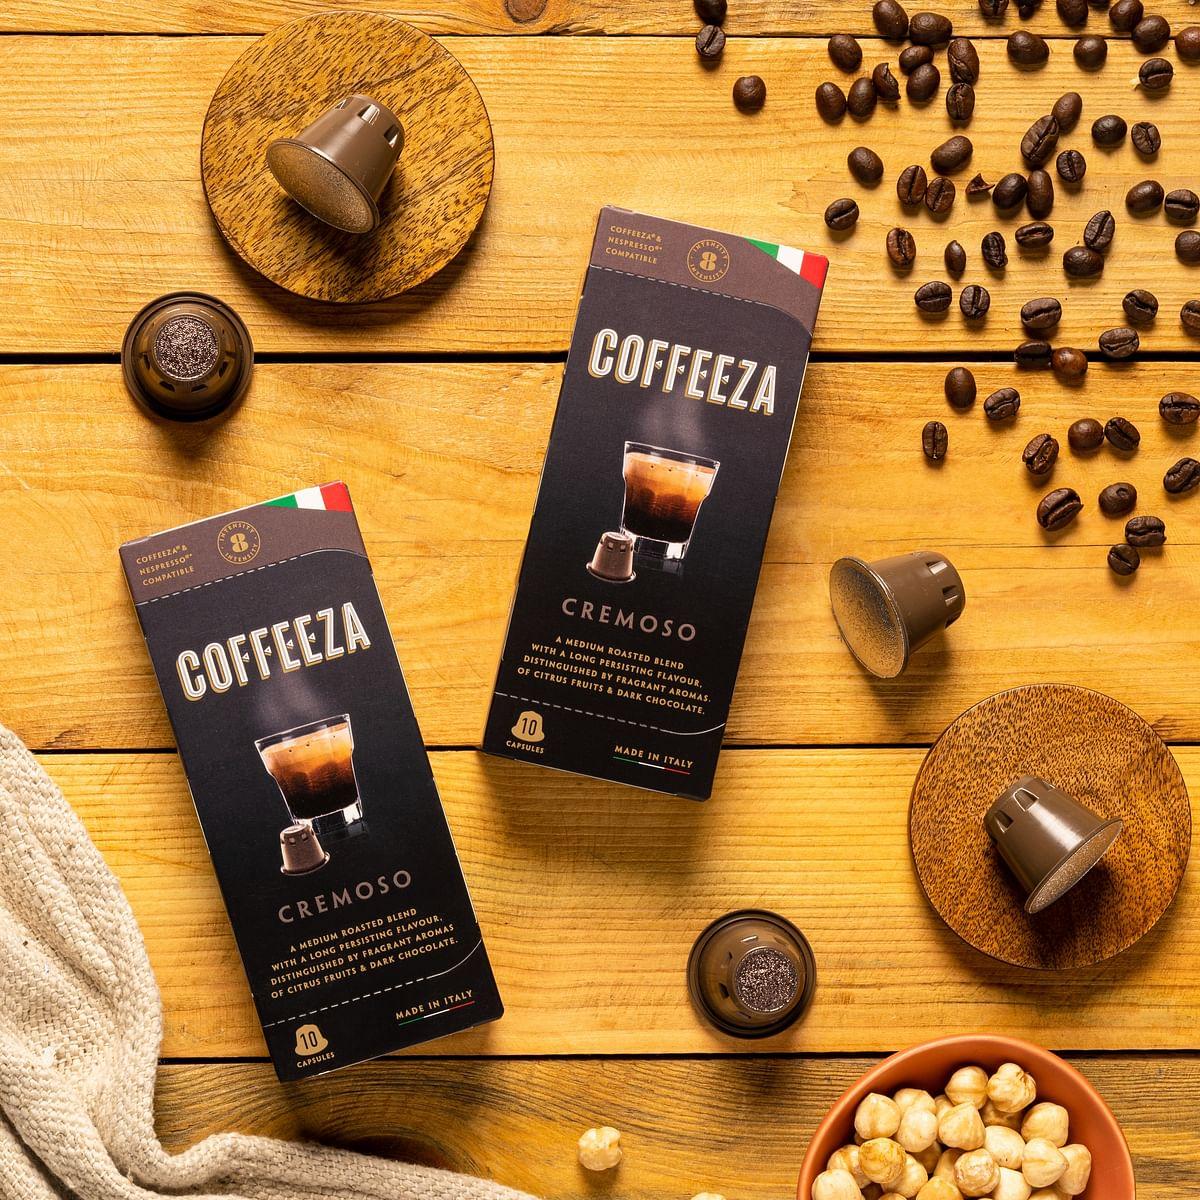 Coffeeza's Coffee Capsules